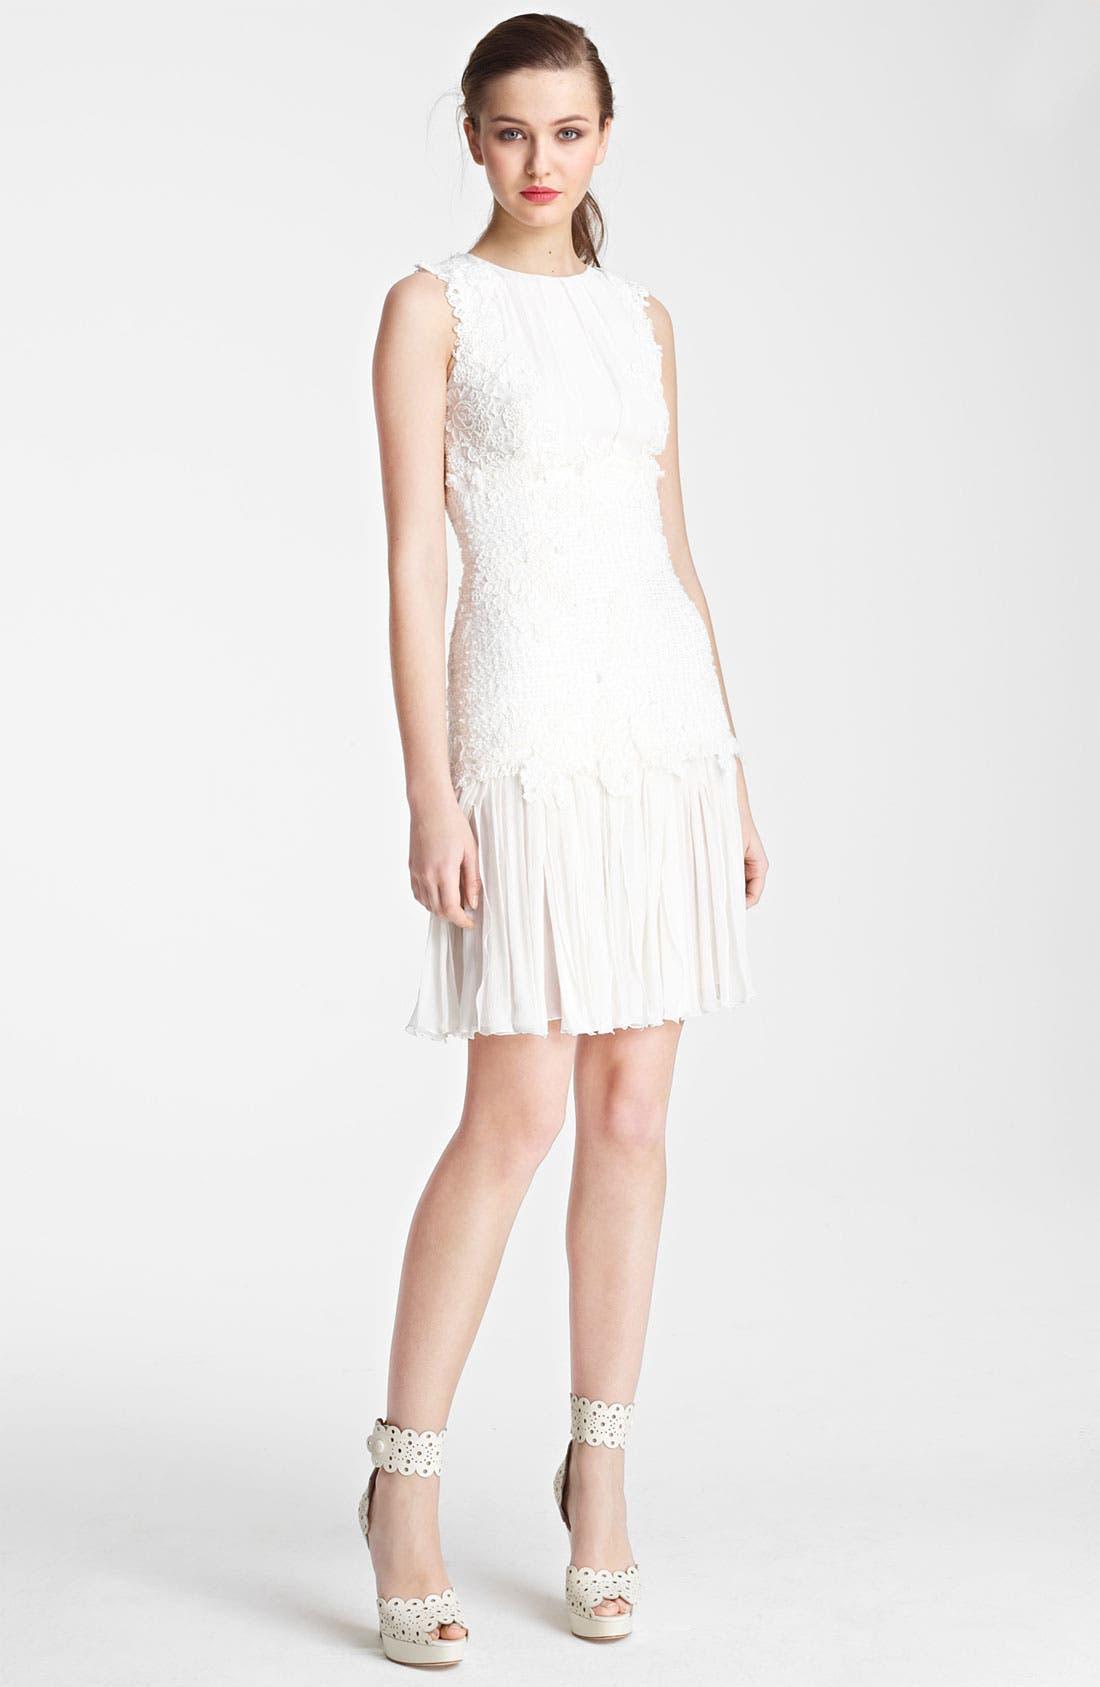 Main Image - Oscar de la Renta Chiffon Dress